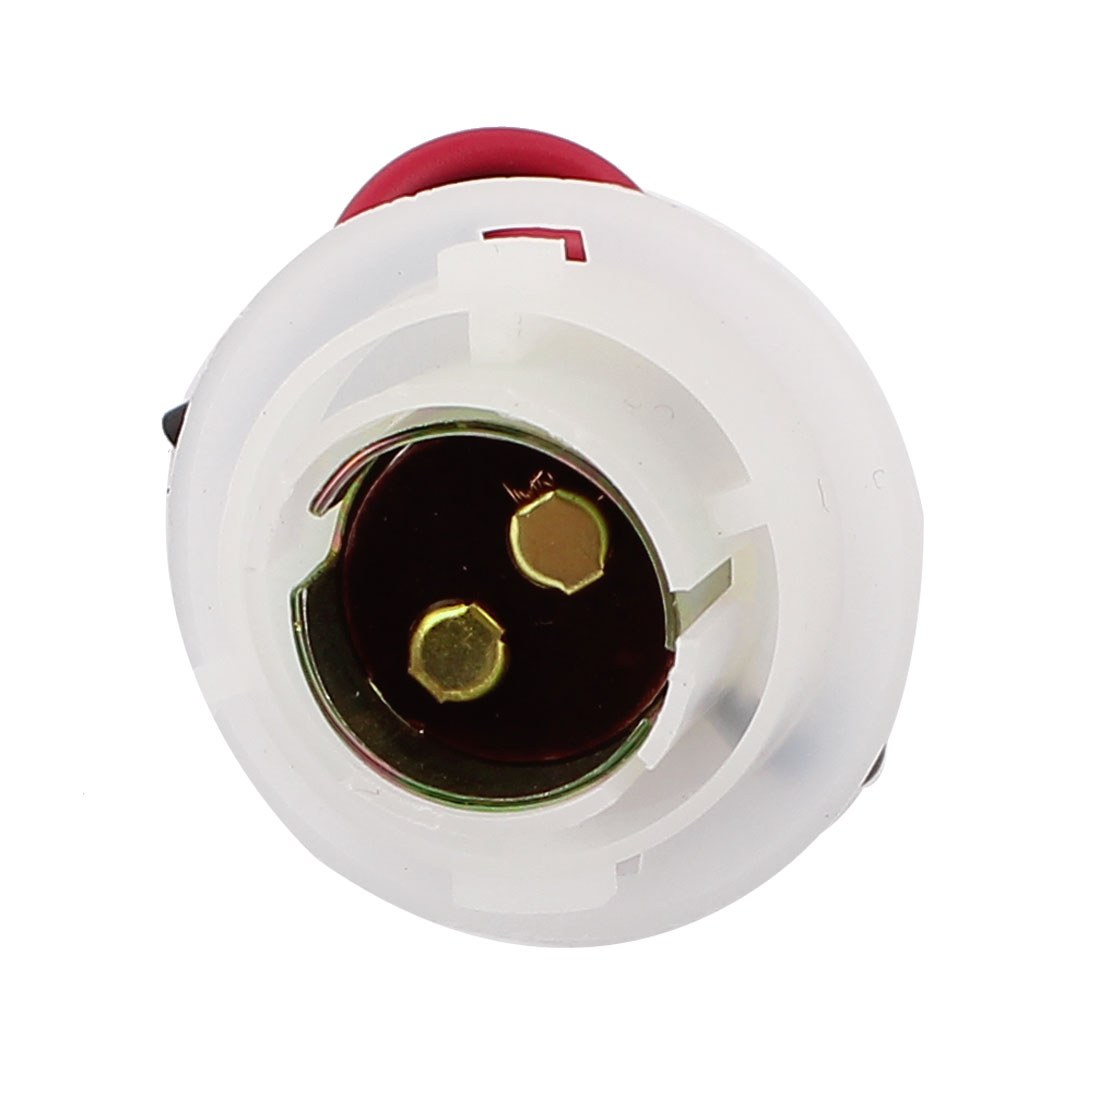 Wiring Park Backup Brake Tail Lights Turn Signal 1157 Lamp Sockets